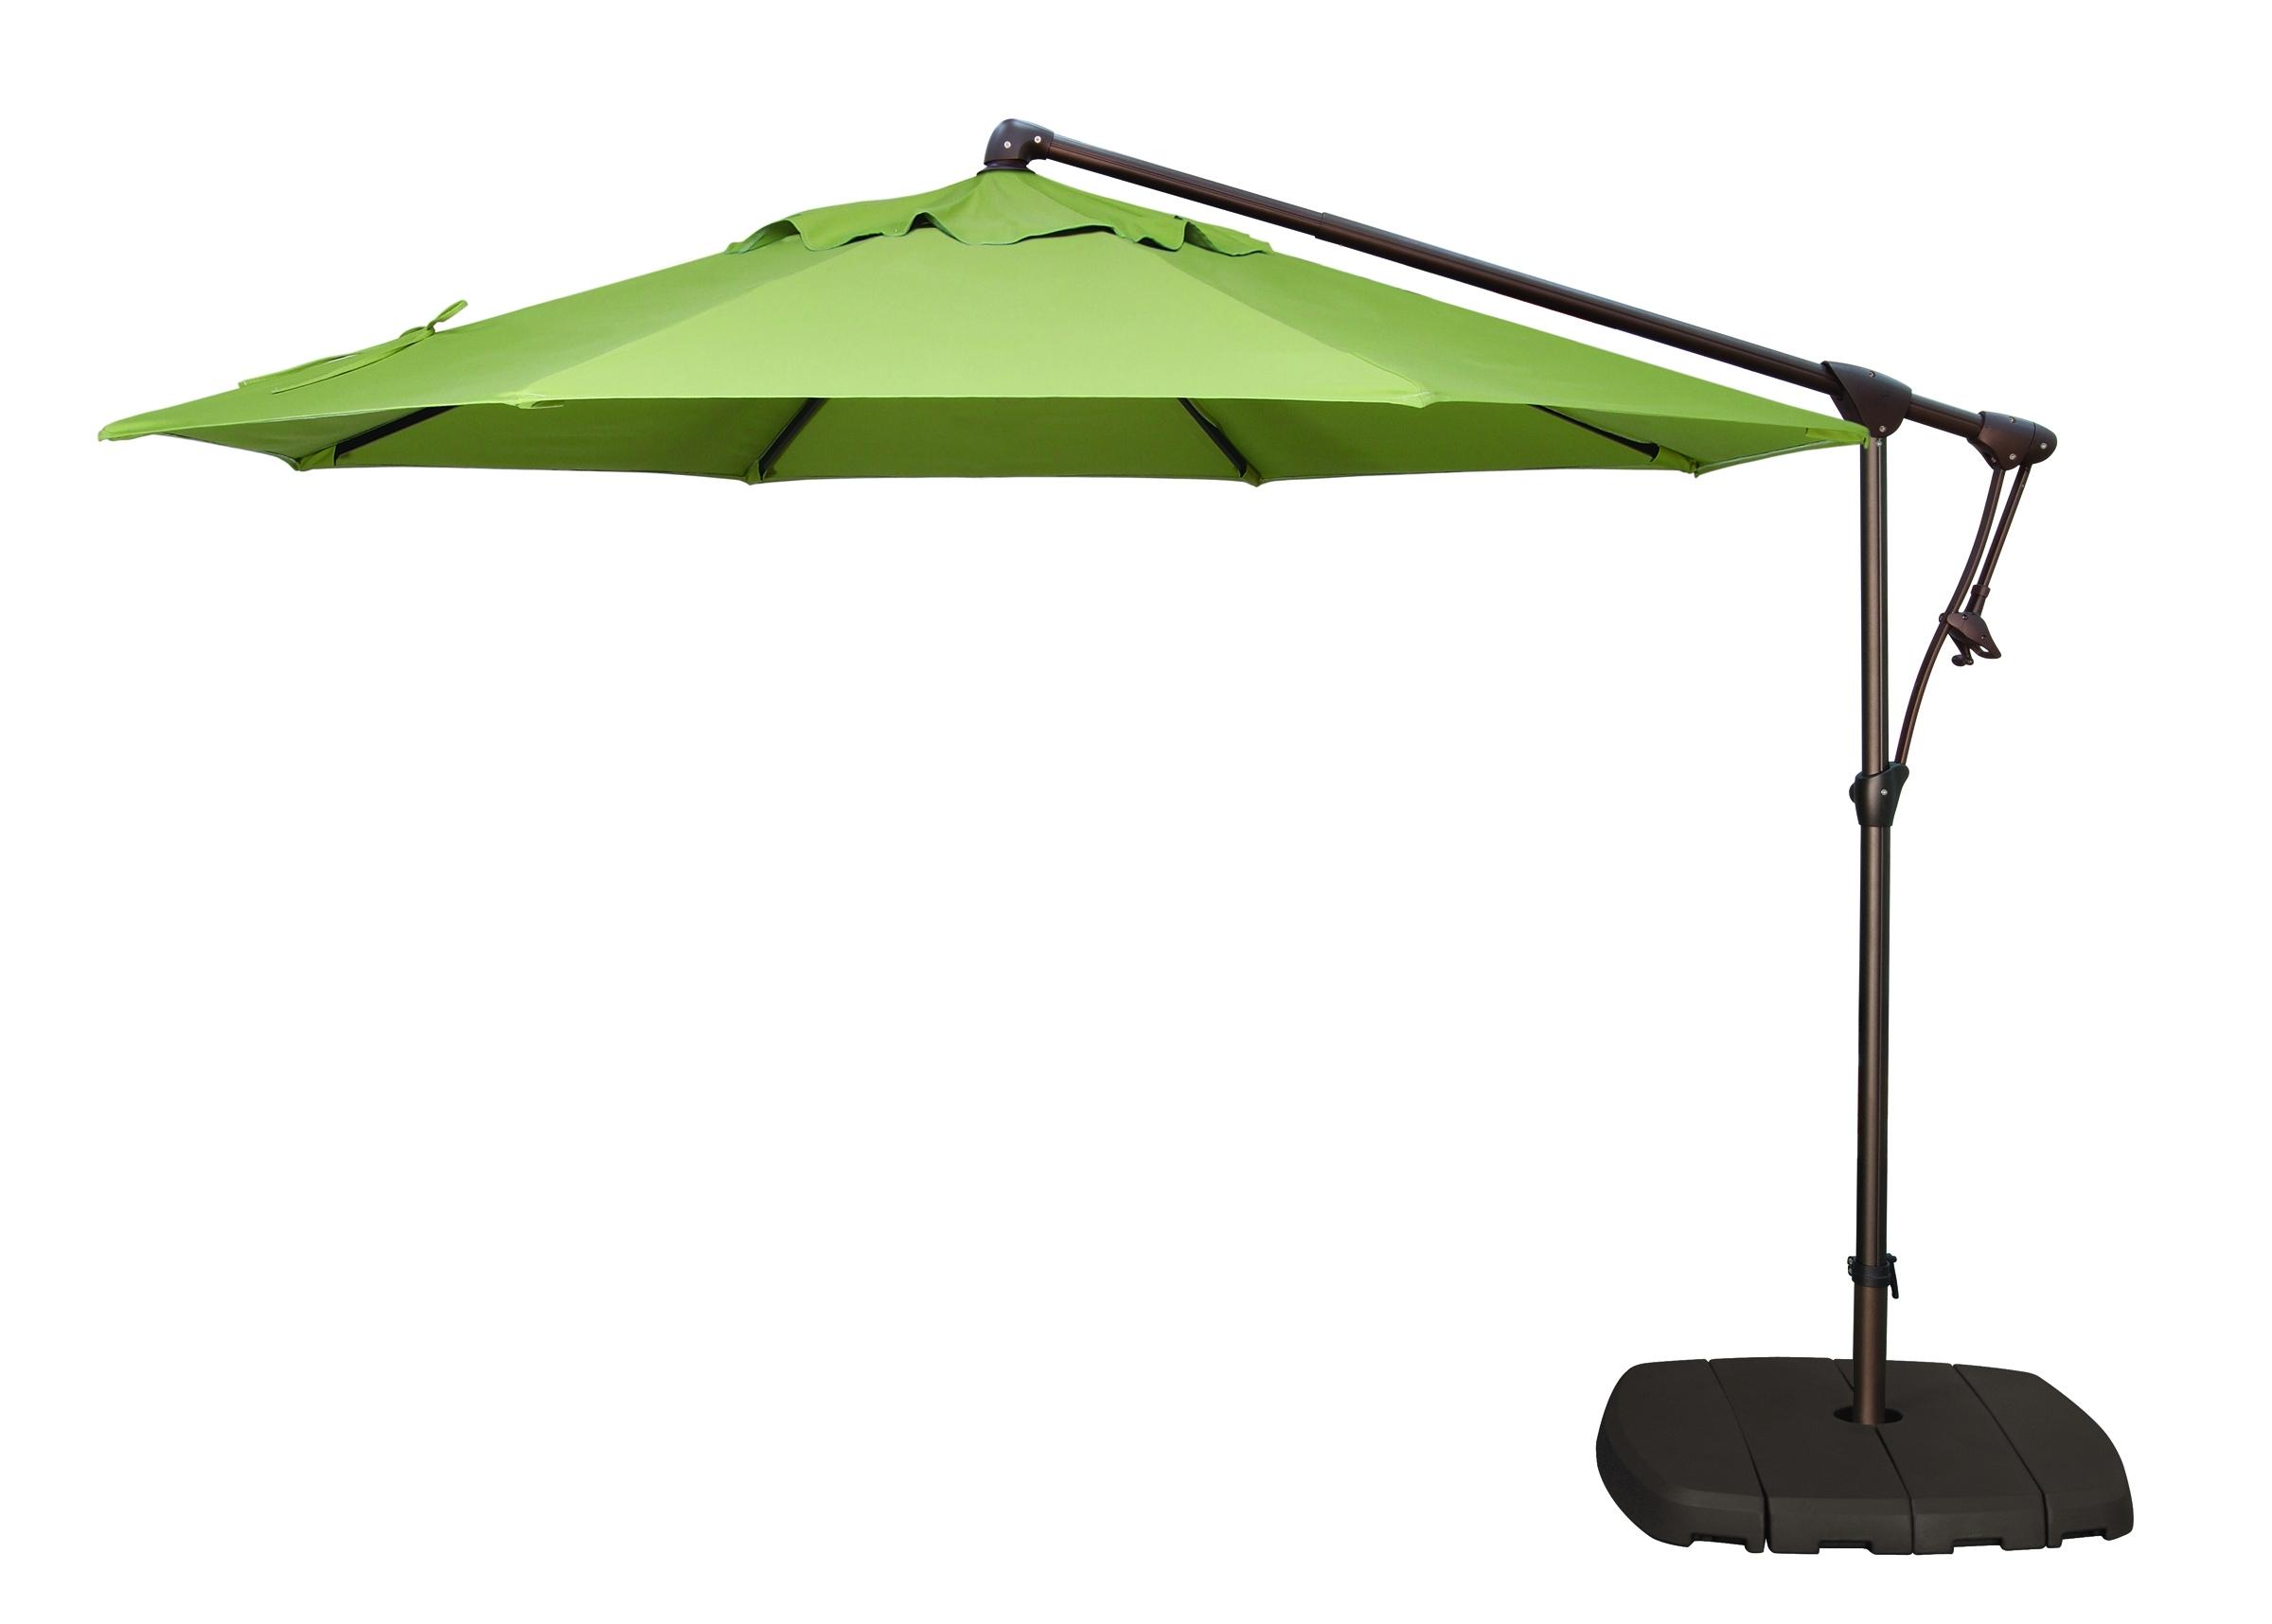 Most Current Sunbrella Patio Umbrellas At Walmart Intended For Patio Umbrellas Walmart – Home Design Ideas (View 8 of 20)